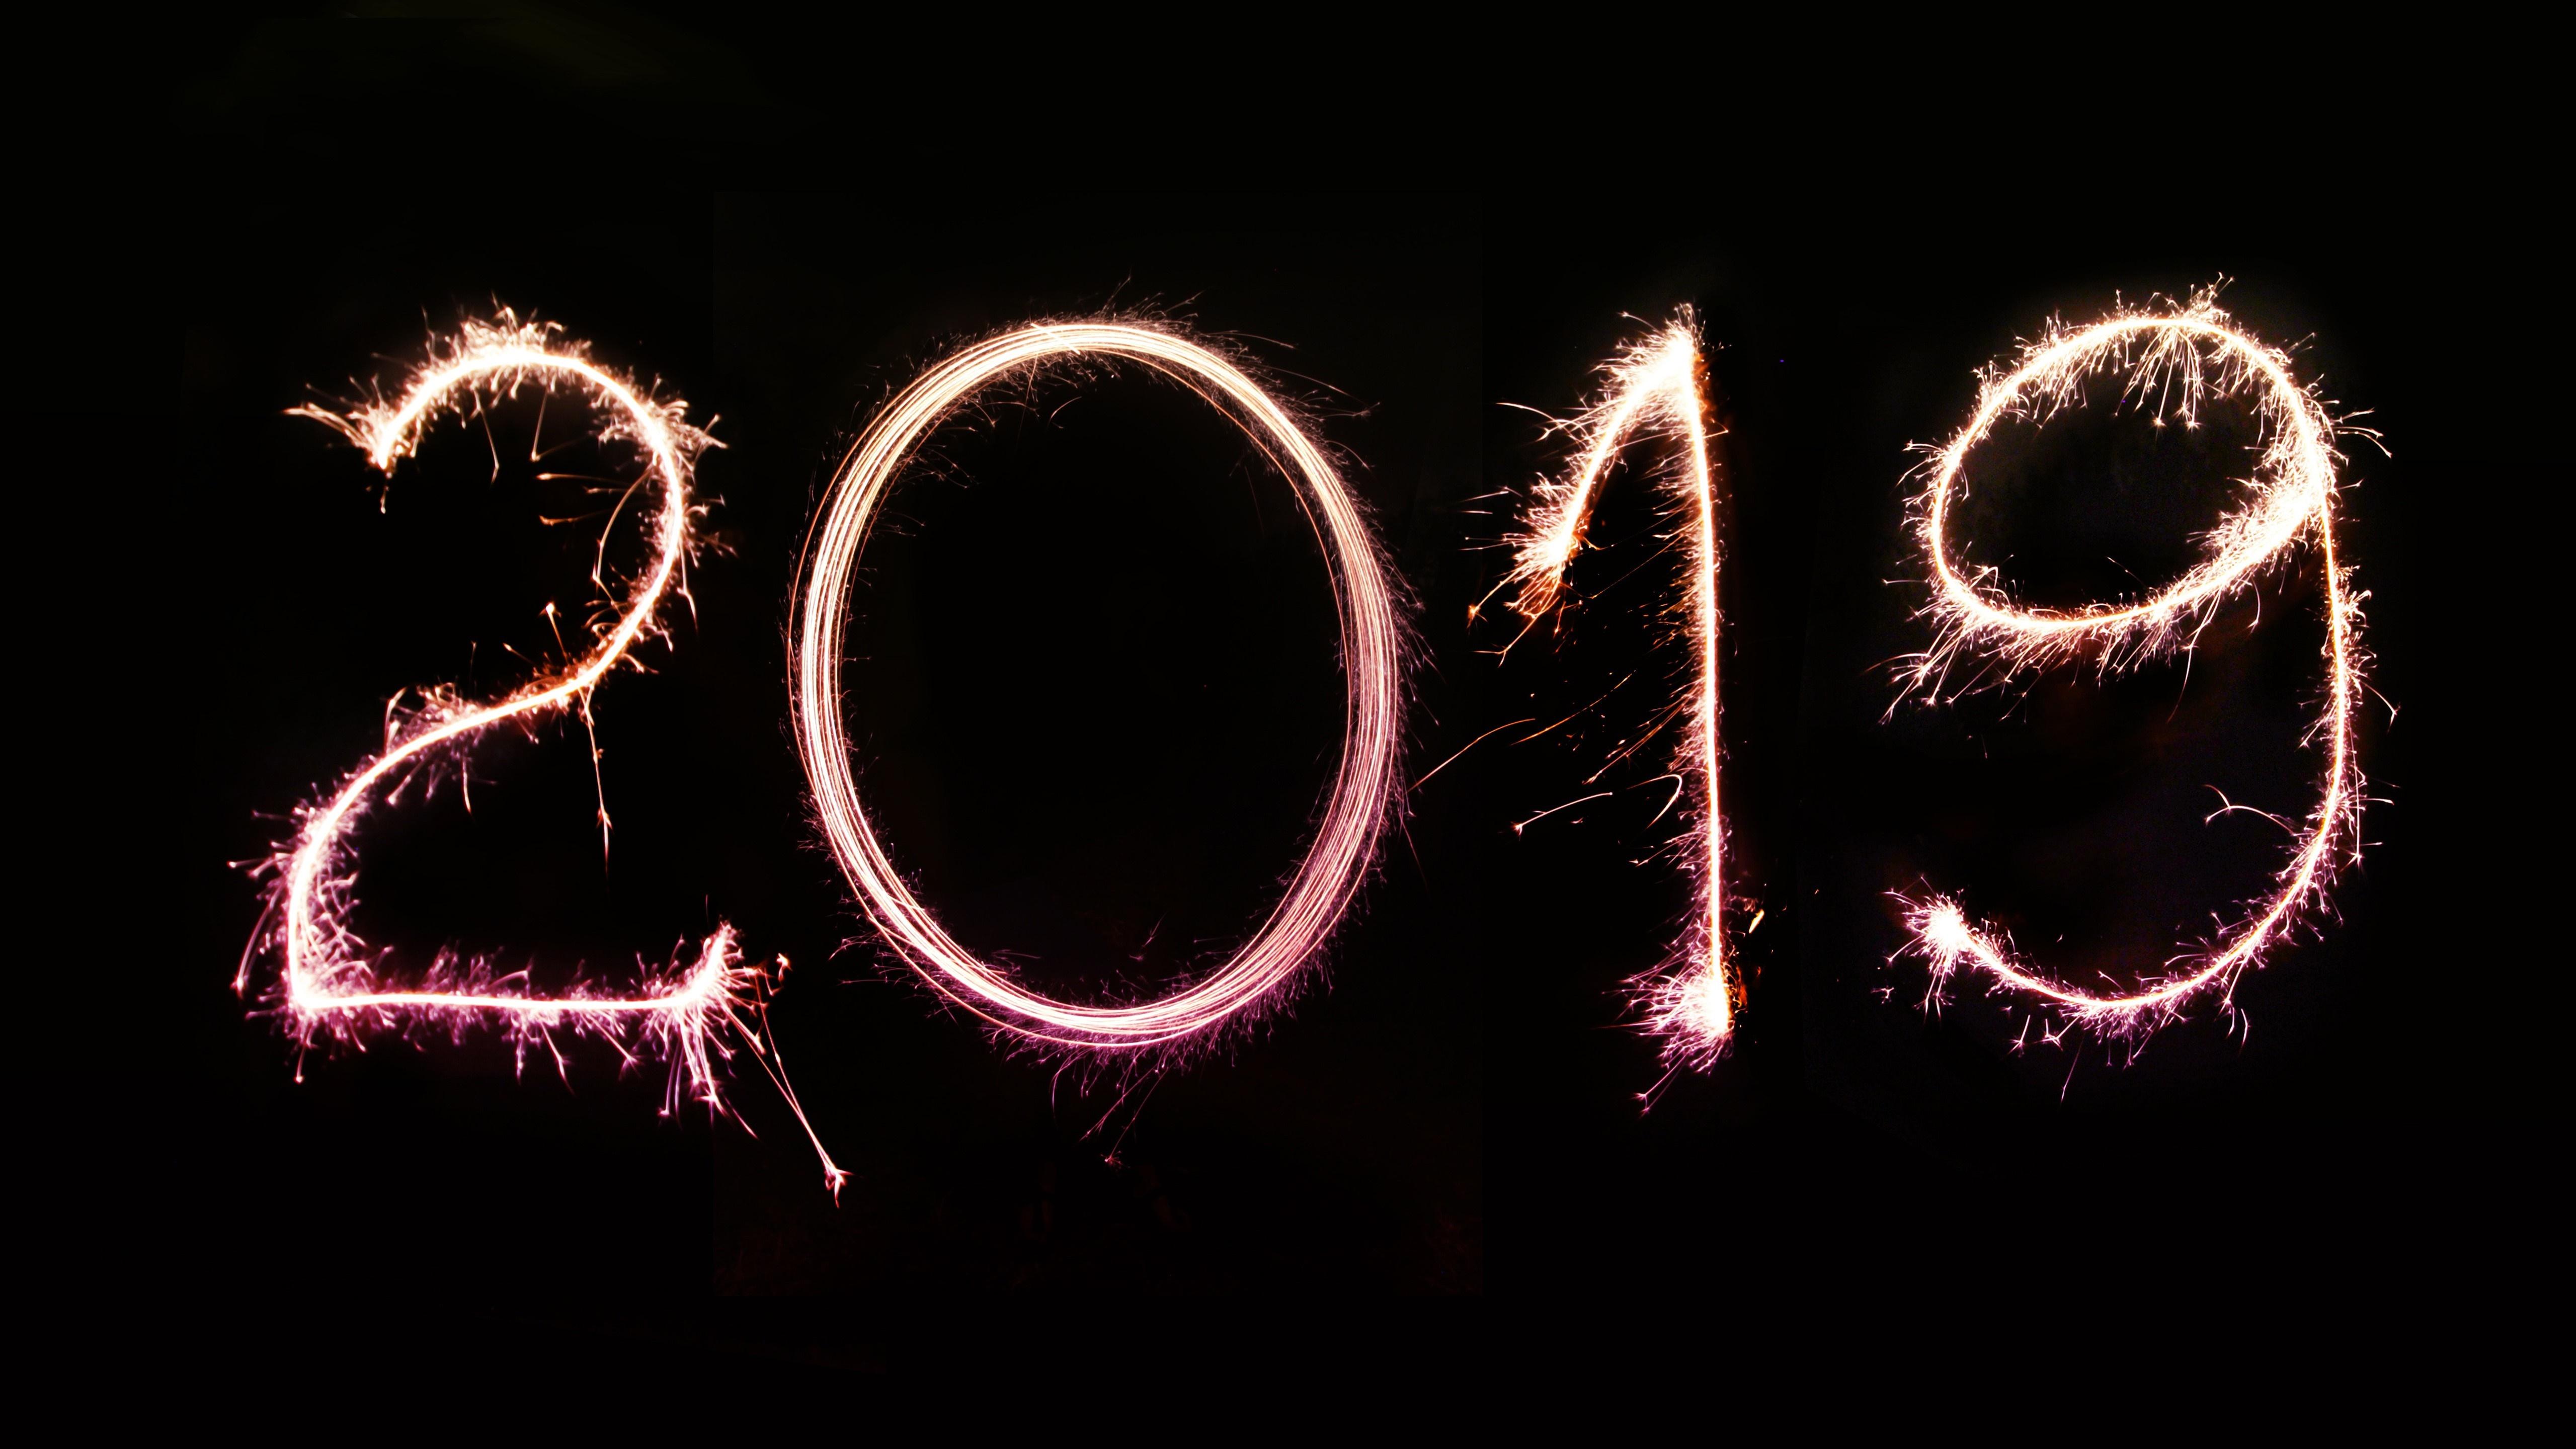 2019 fireworks wallpaper